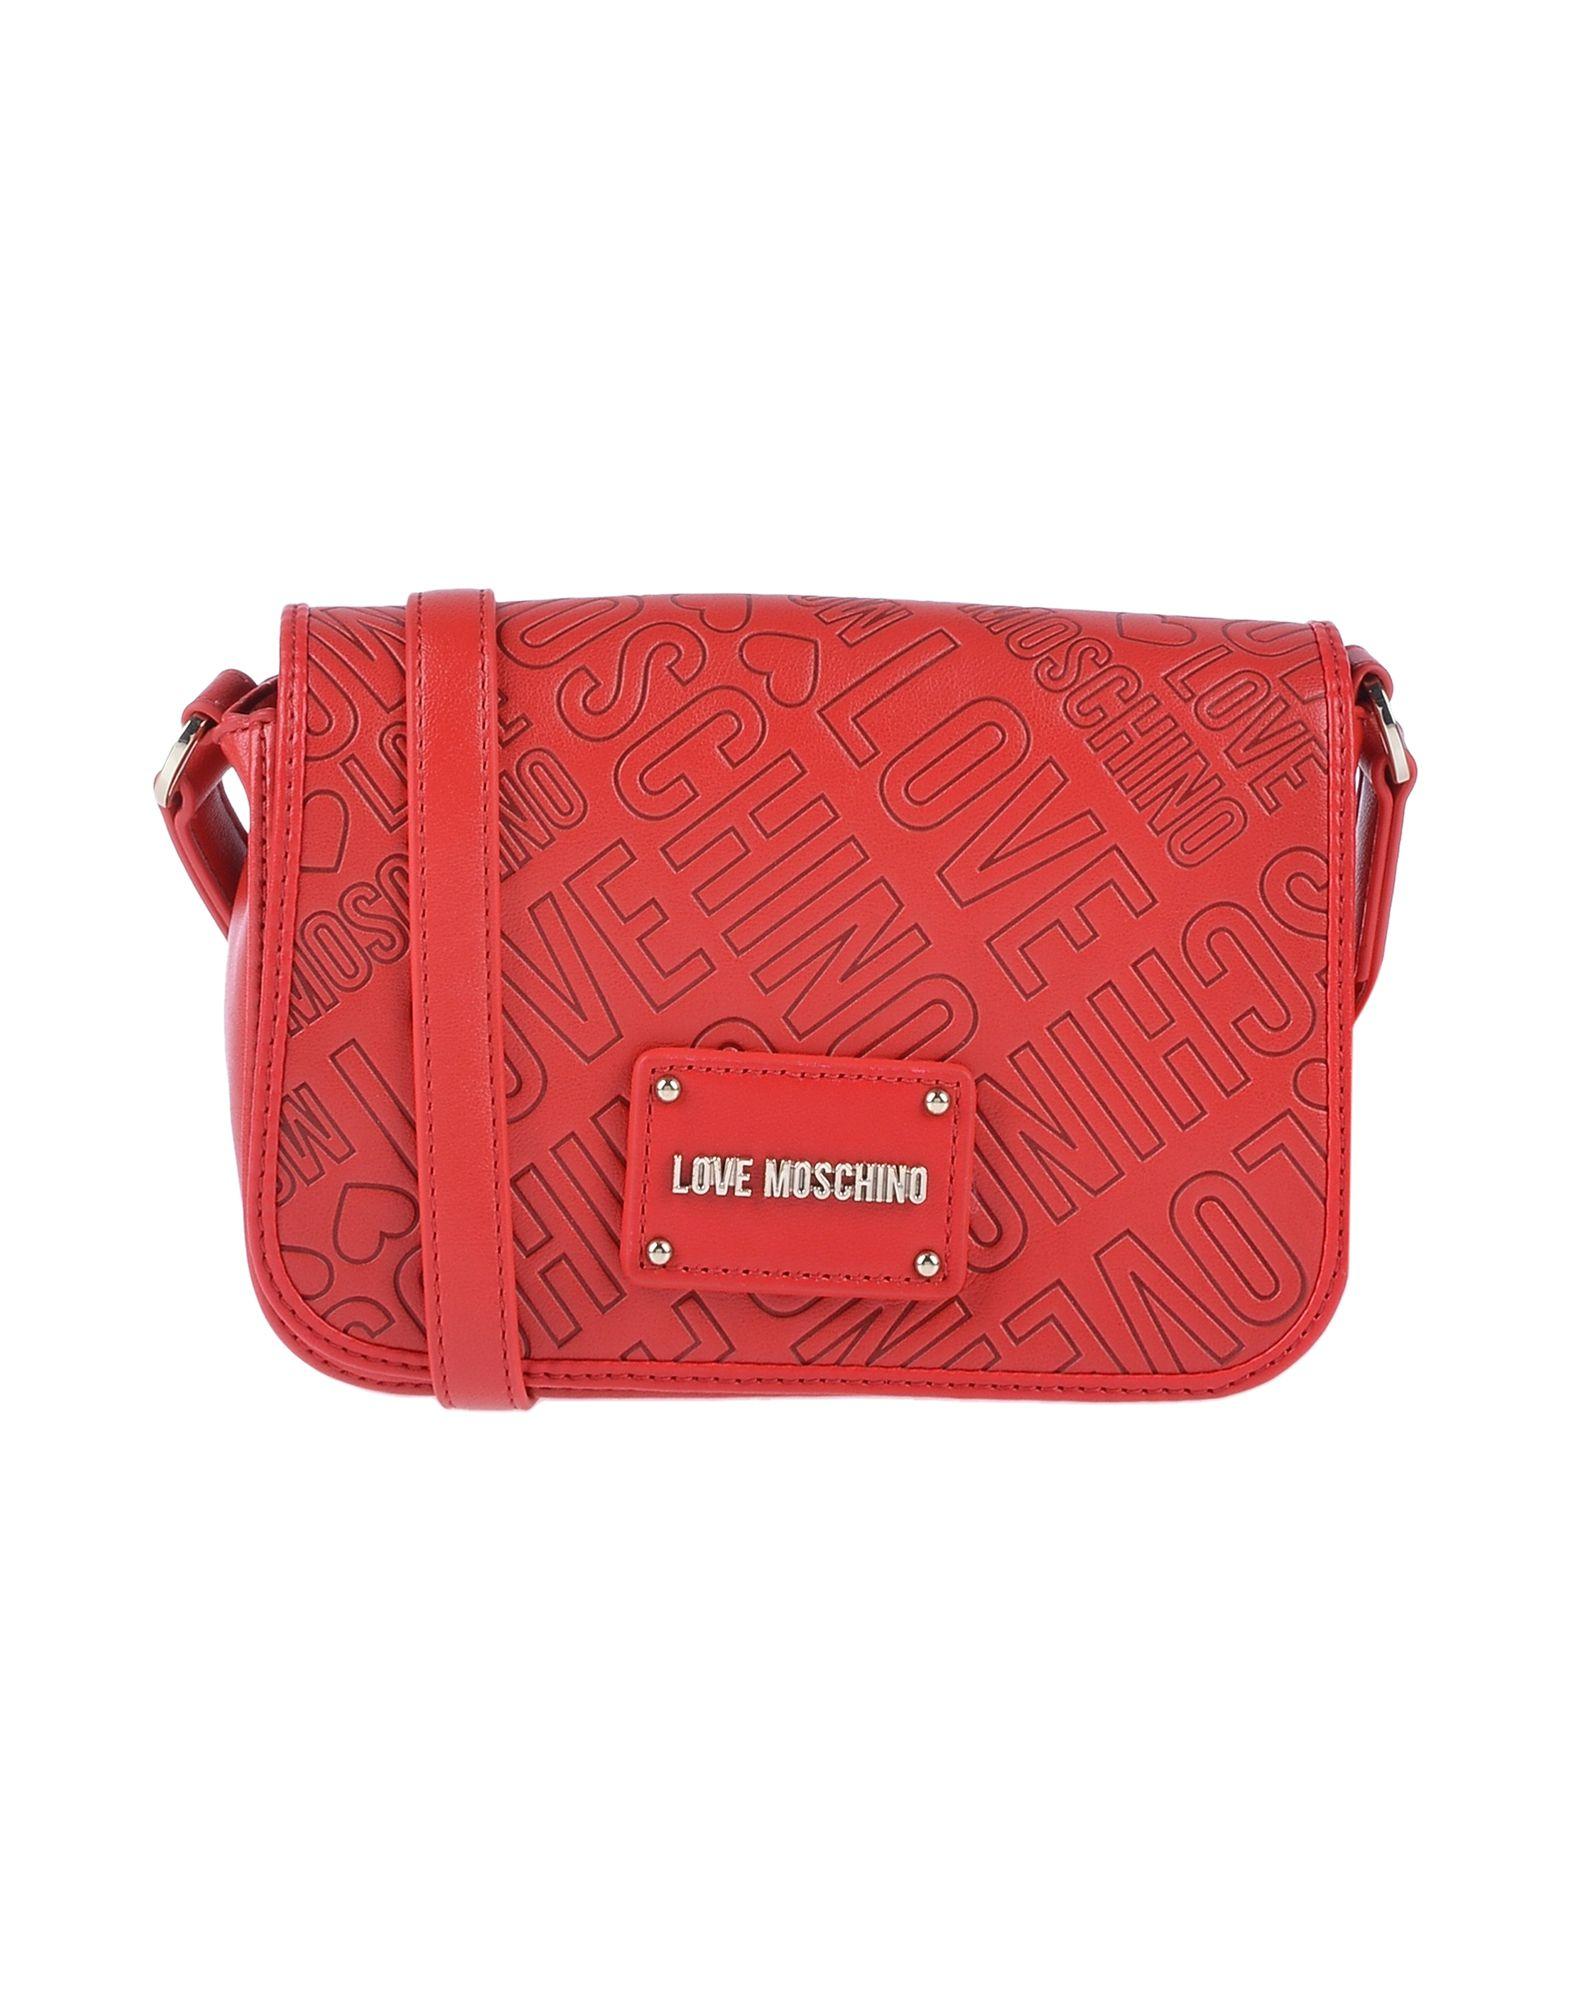 LOVE MOSCHINO Сумка через плечо сумка через плечо anais gvani croco ag 1471 350161